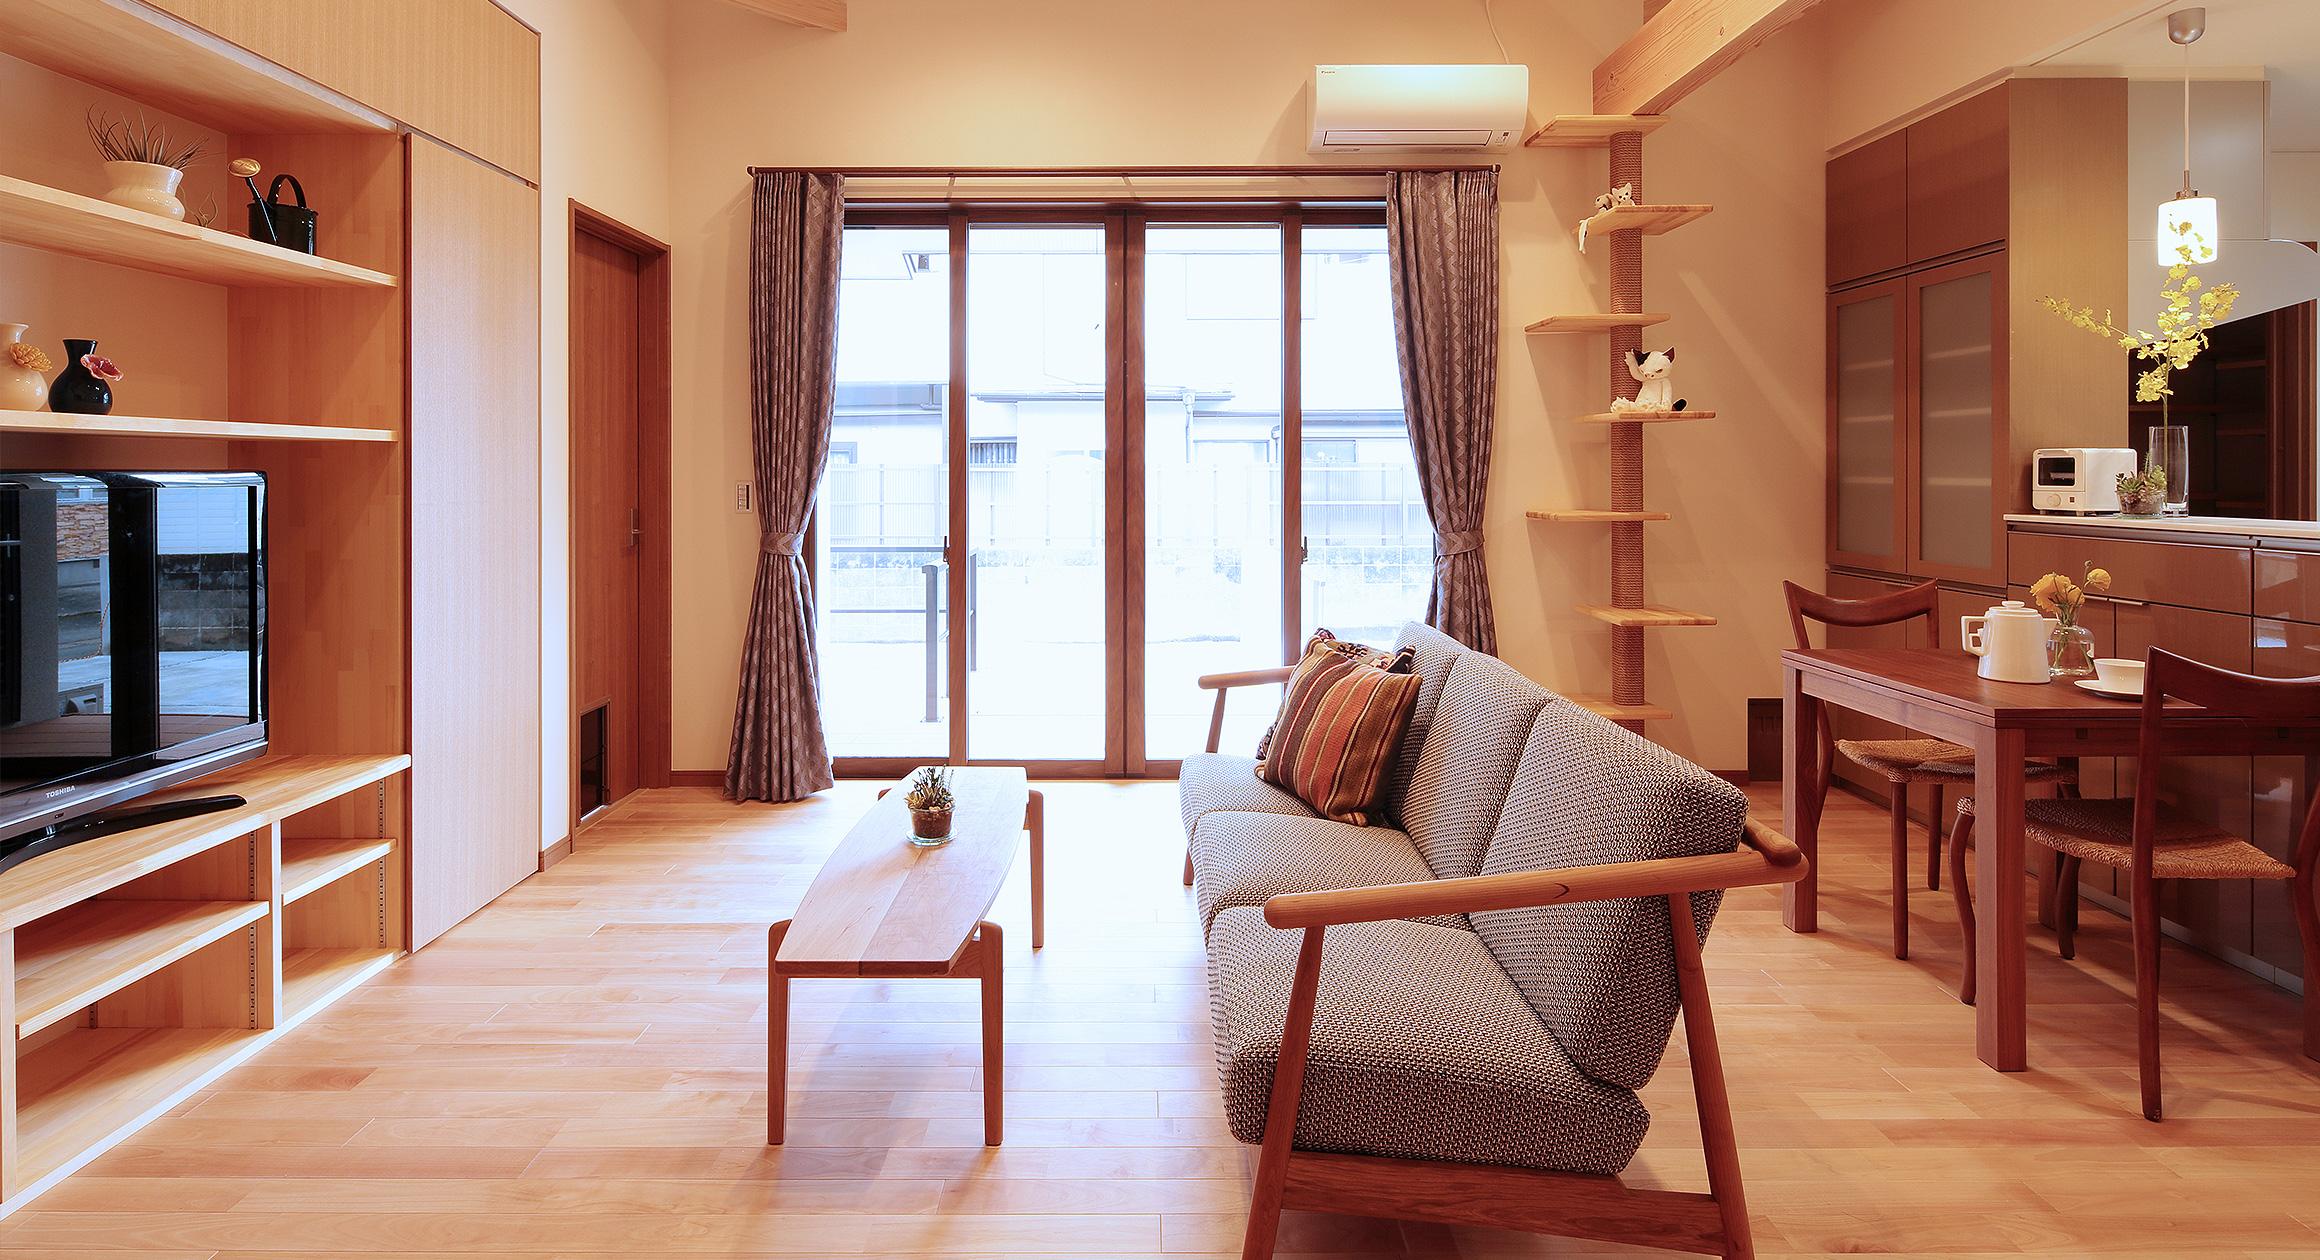 三友工務店の新築注文住宅 熊本市F様邸